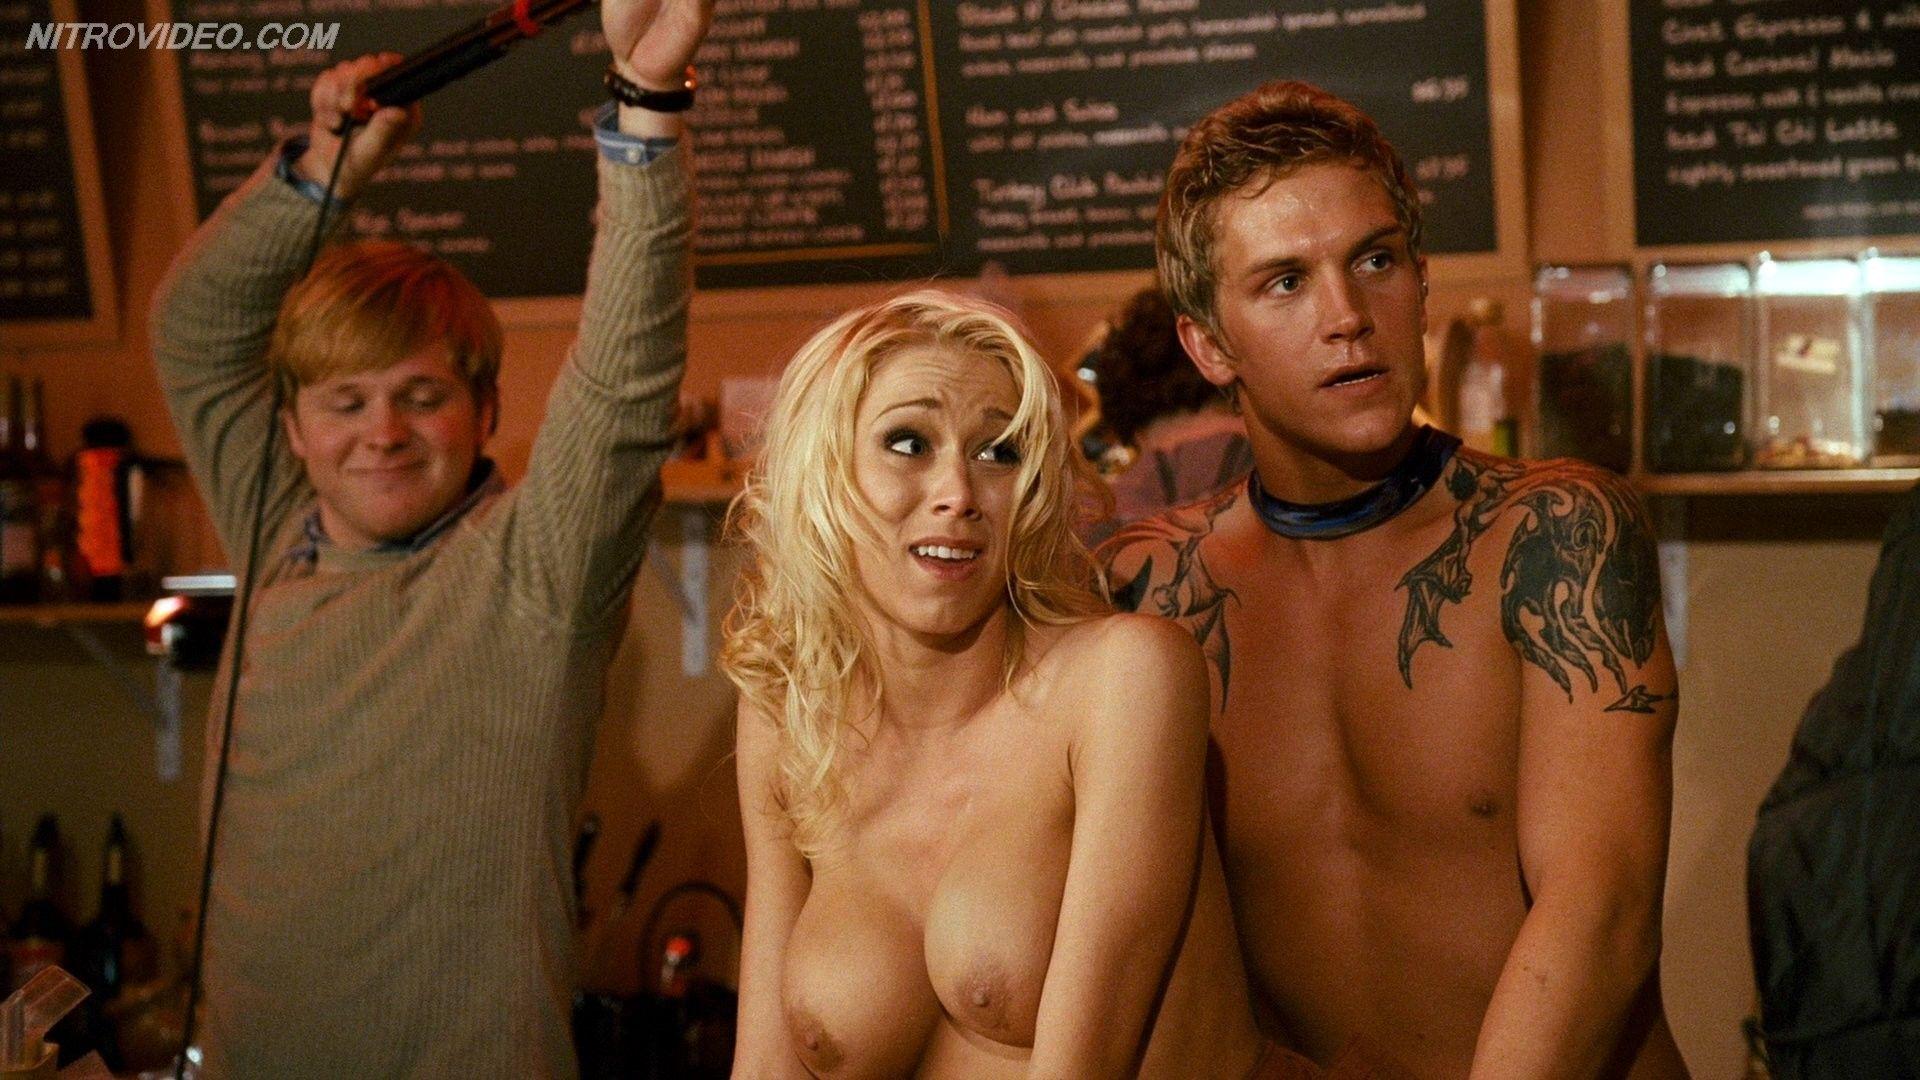 Zack and miri making porn